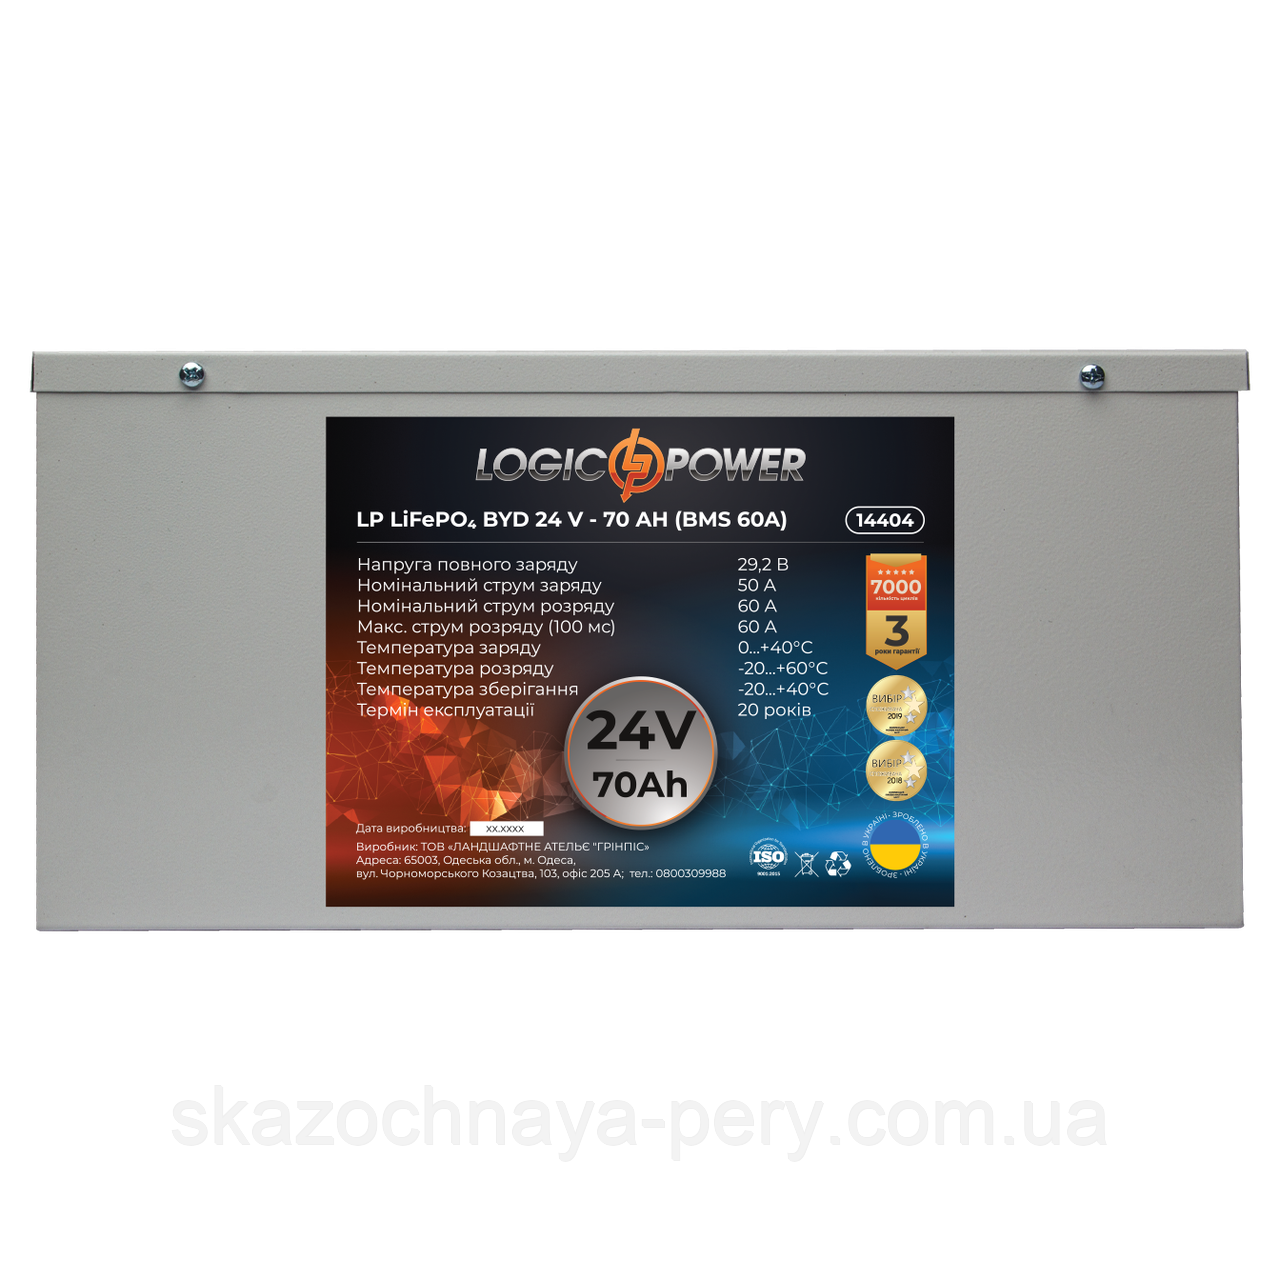 Акумулятор LP LiFePO4 BYD 24V - 70 Ah (BMS 60А) метал